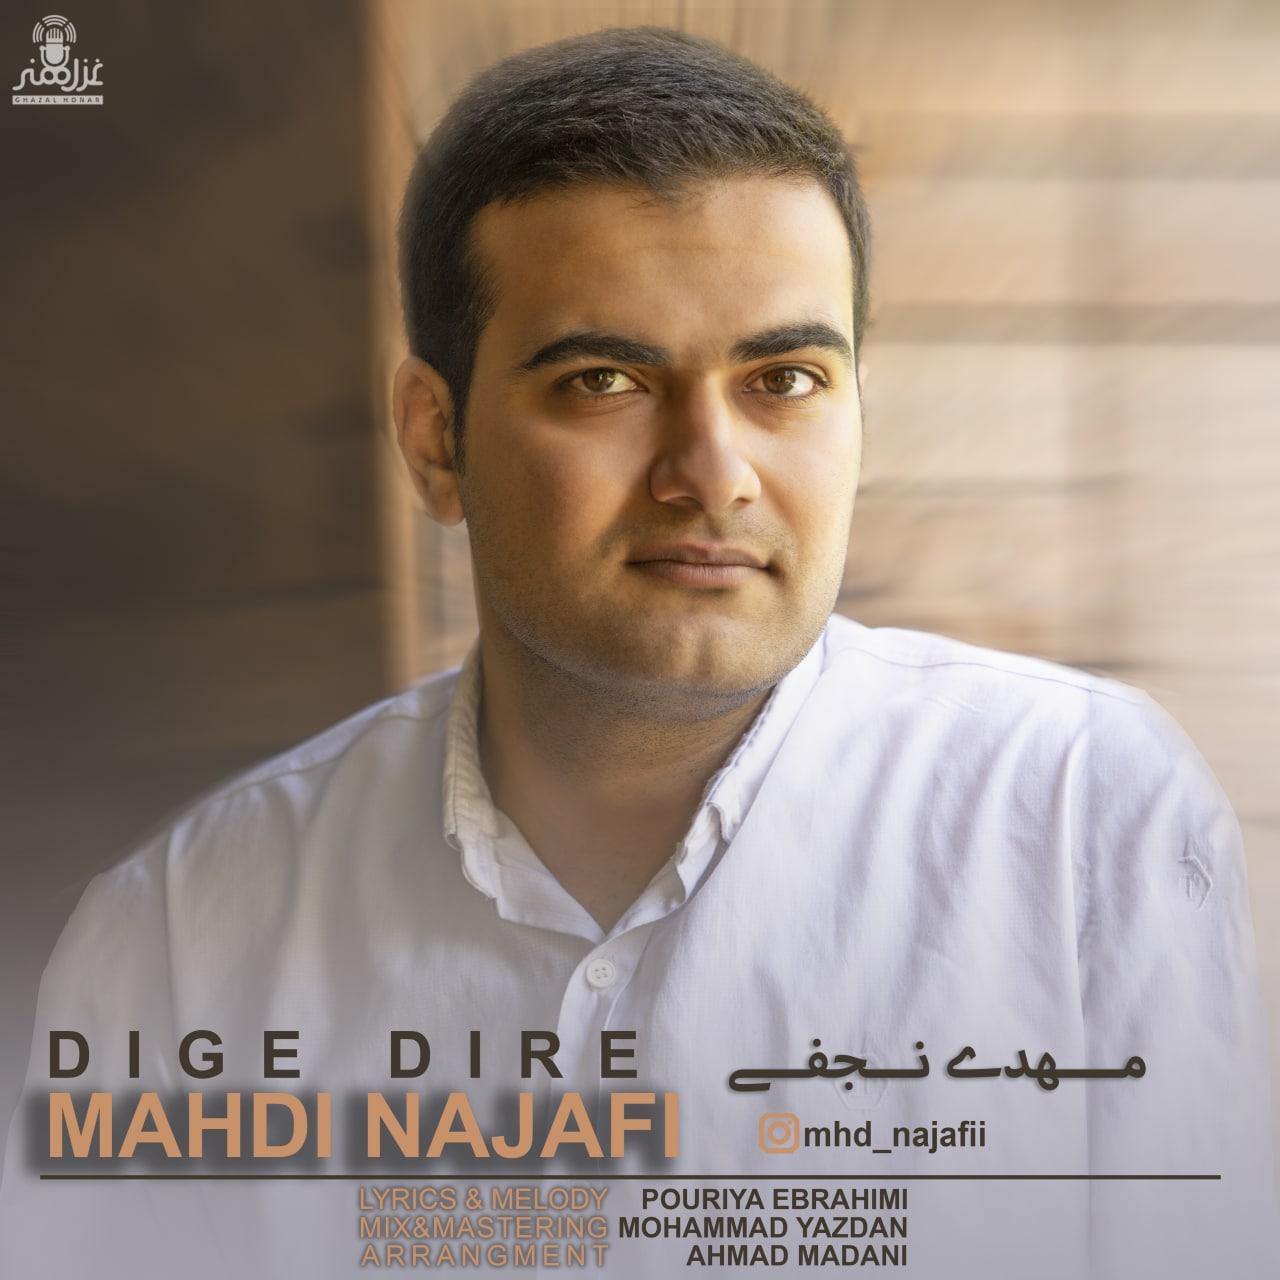 Mahdi Najafi – Dige Dire